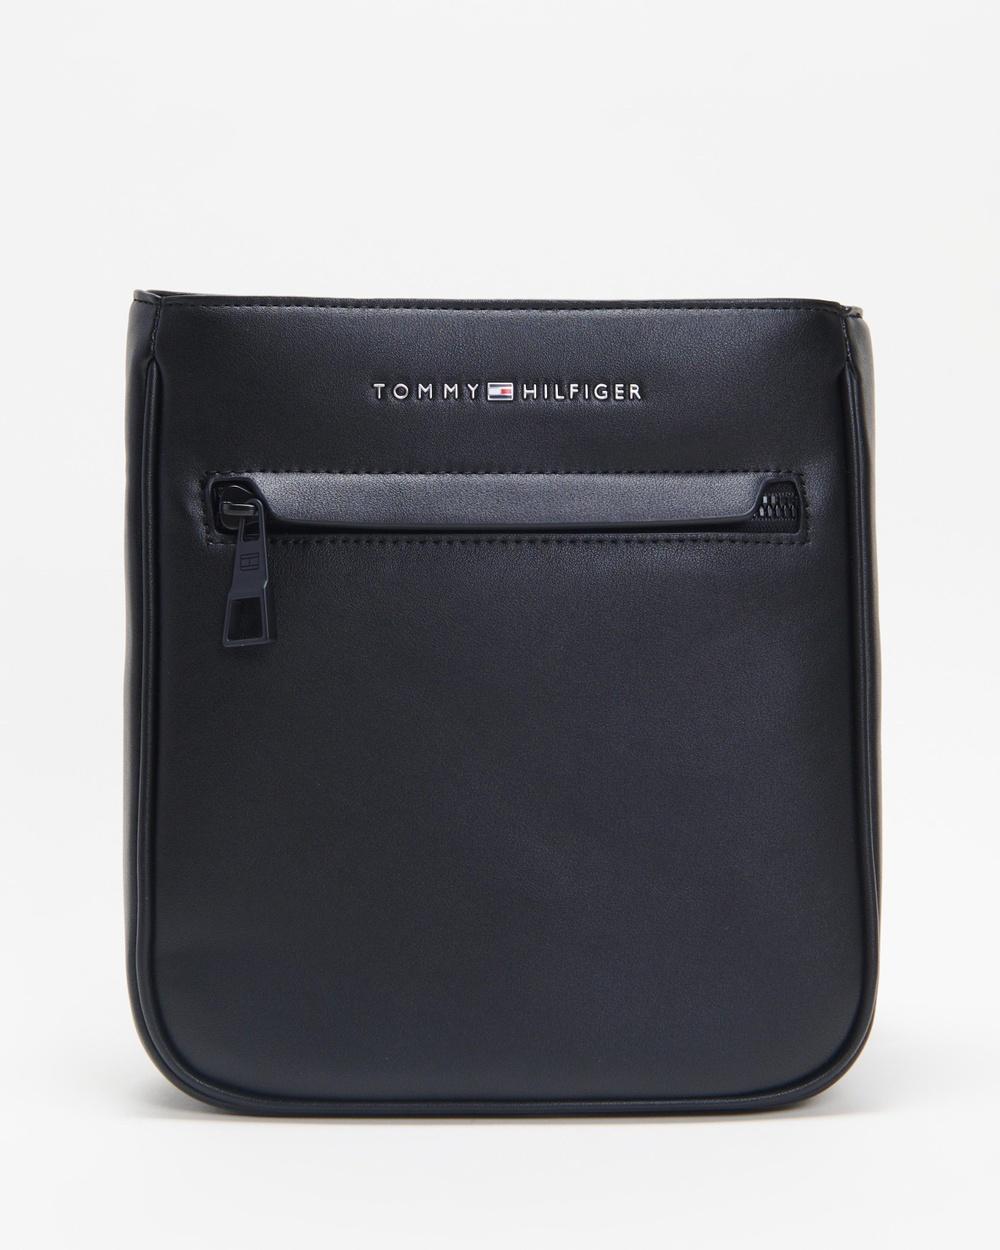 Tommy Hilfiger Metro Mini Crossover Bags Black Australia